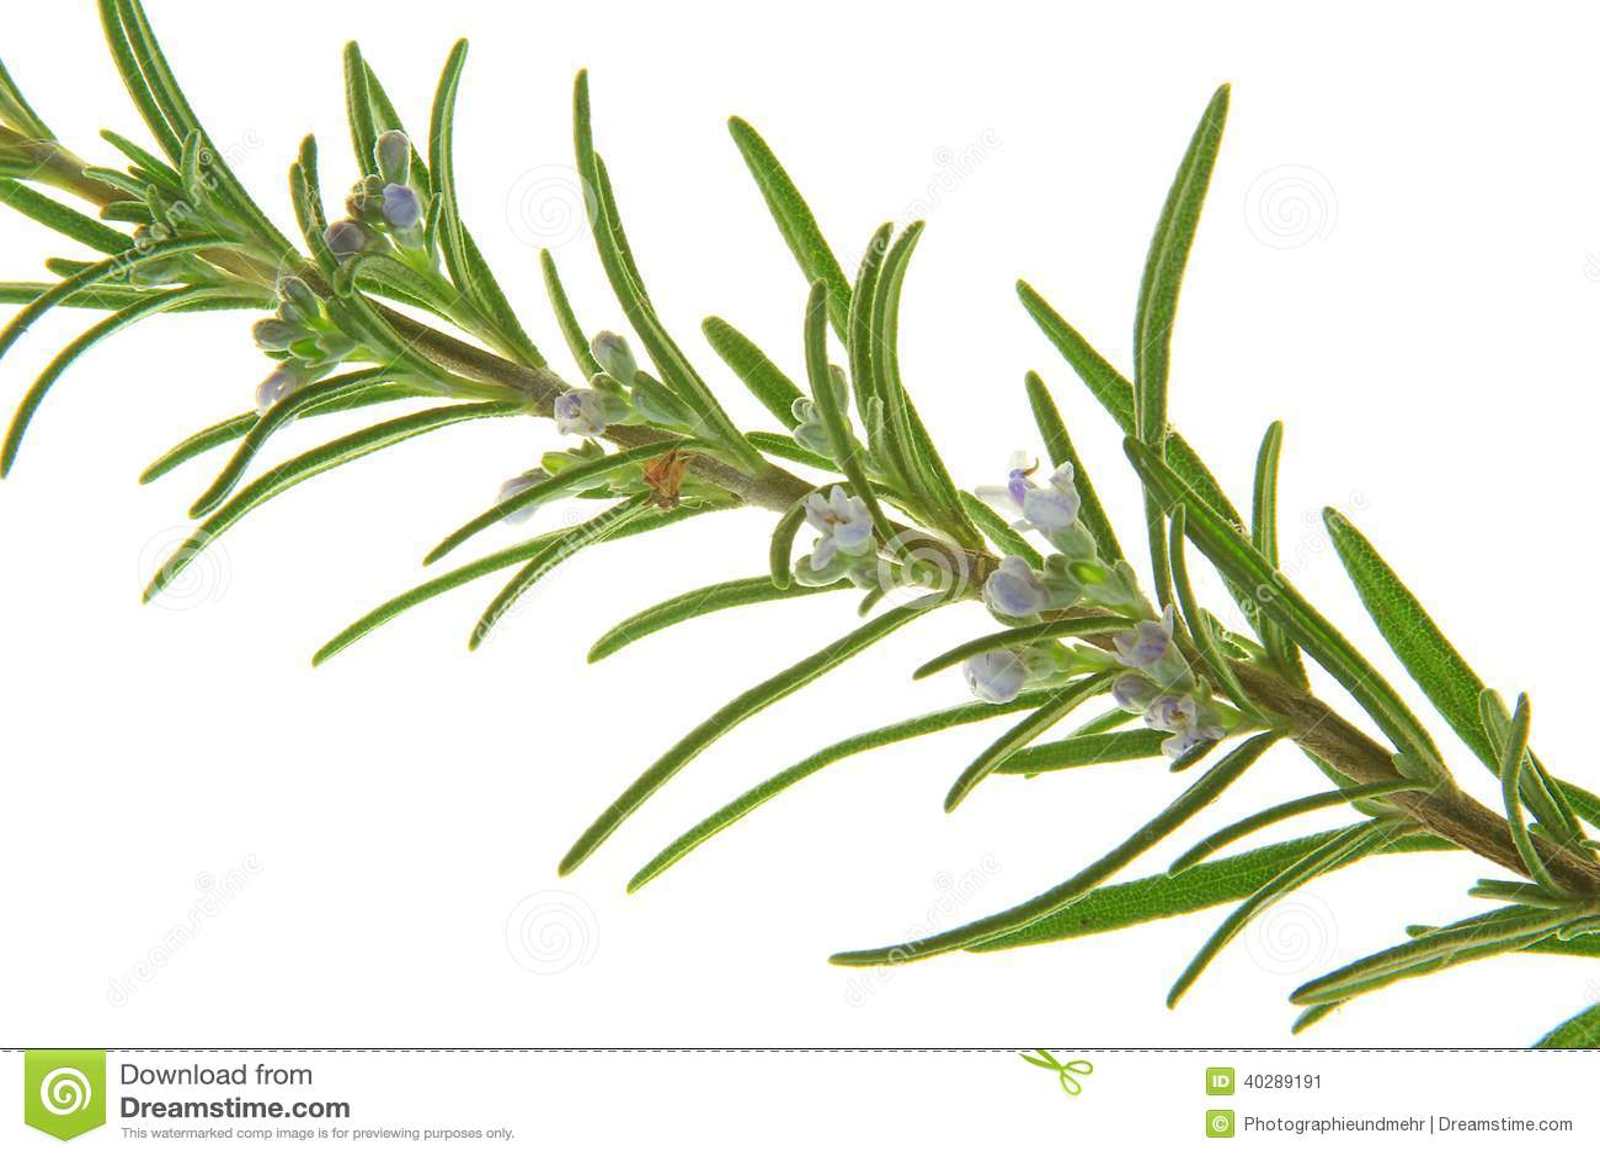 Розмари (officinalis Rosmarinus)